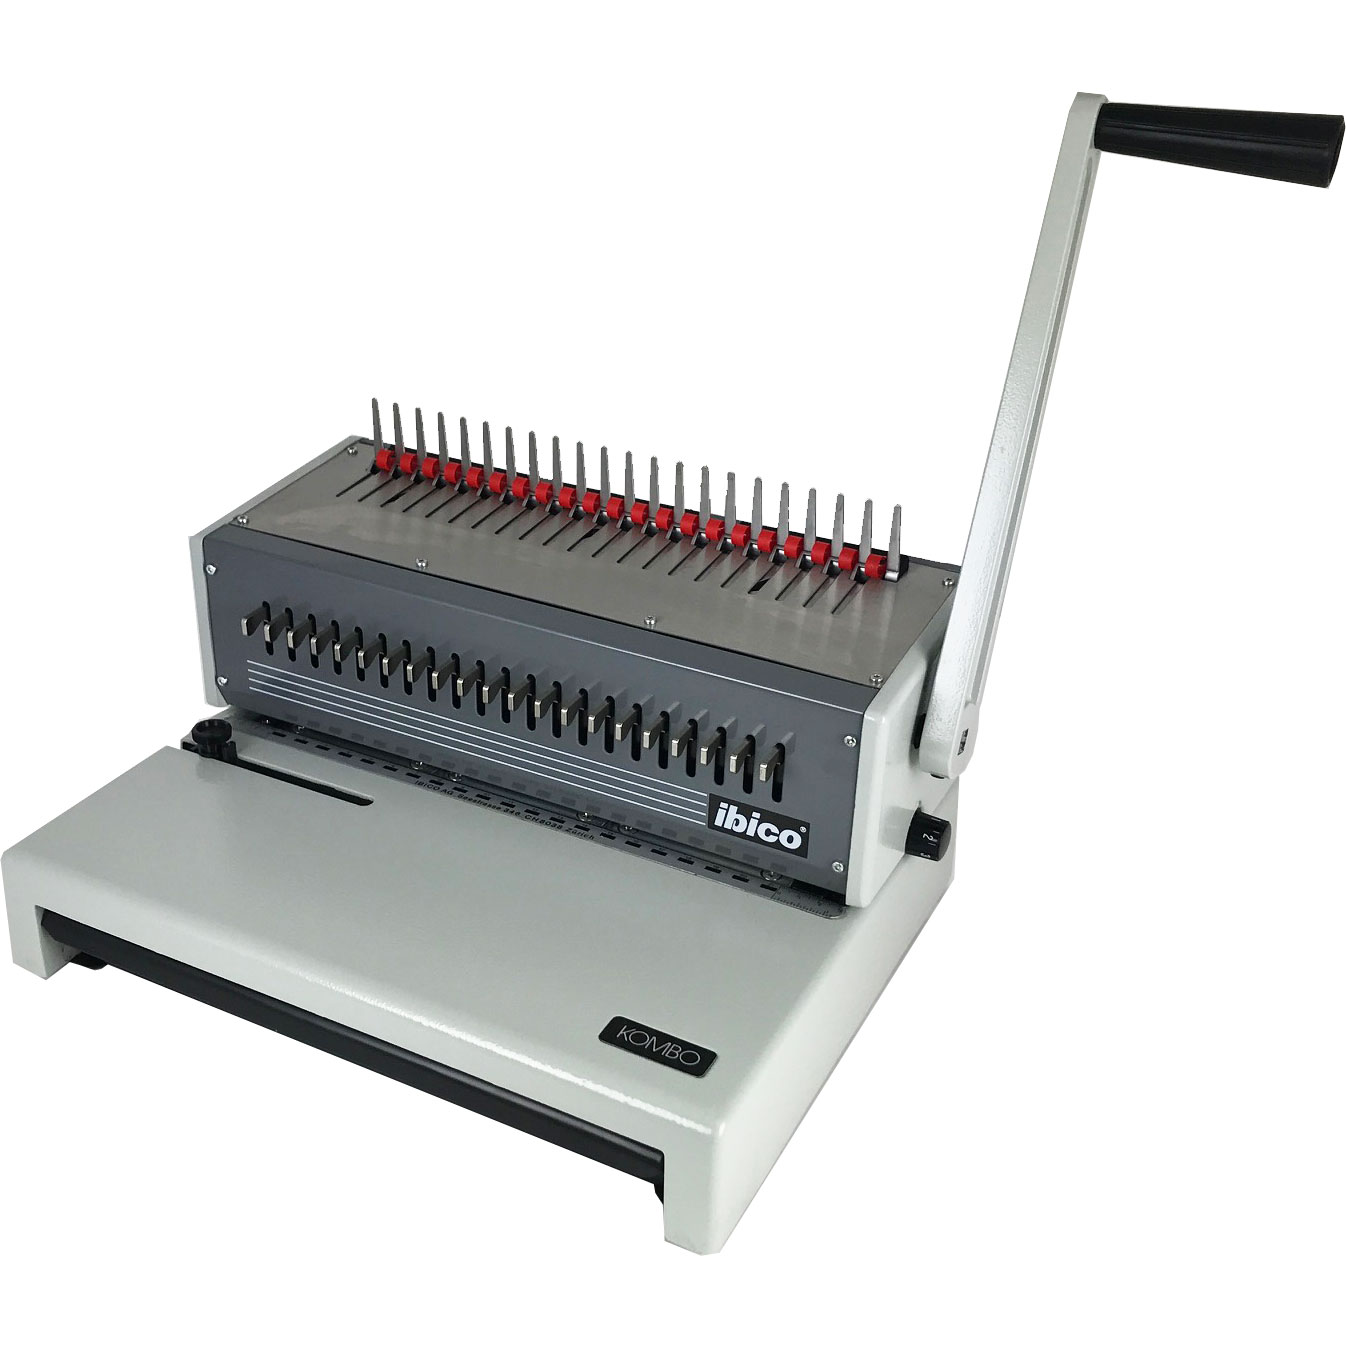 GBC / Ibico Kombo C250Pro/PB21 Manual Plastic-Comb Binding Machine